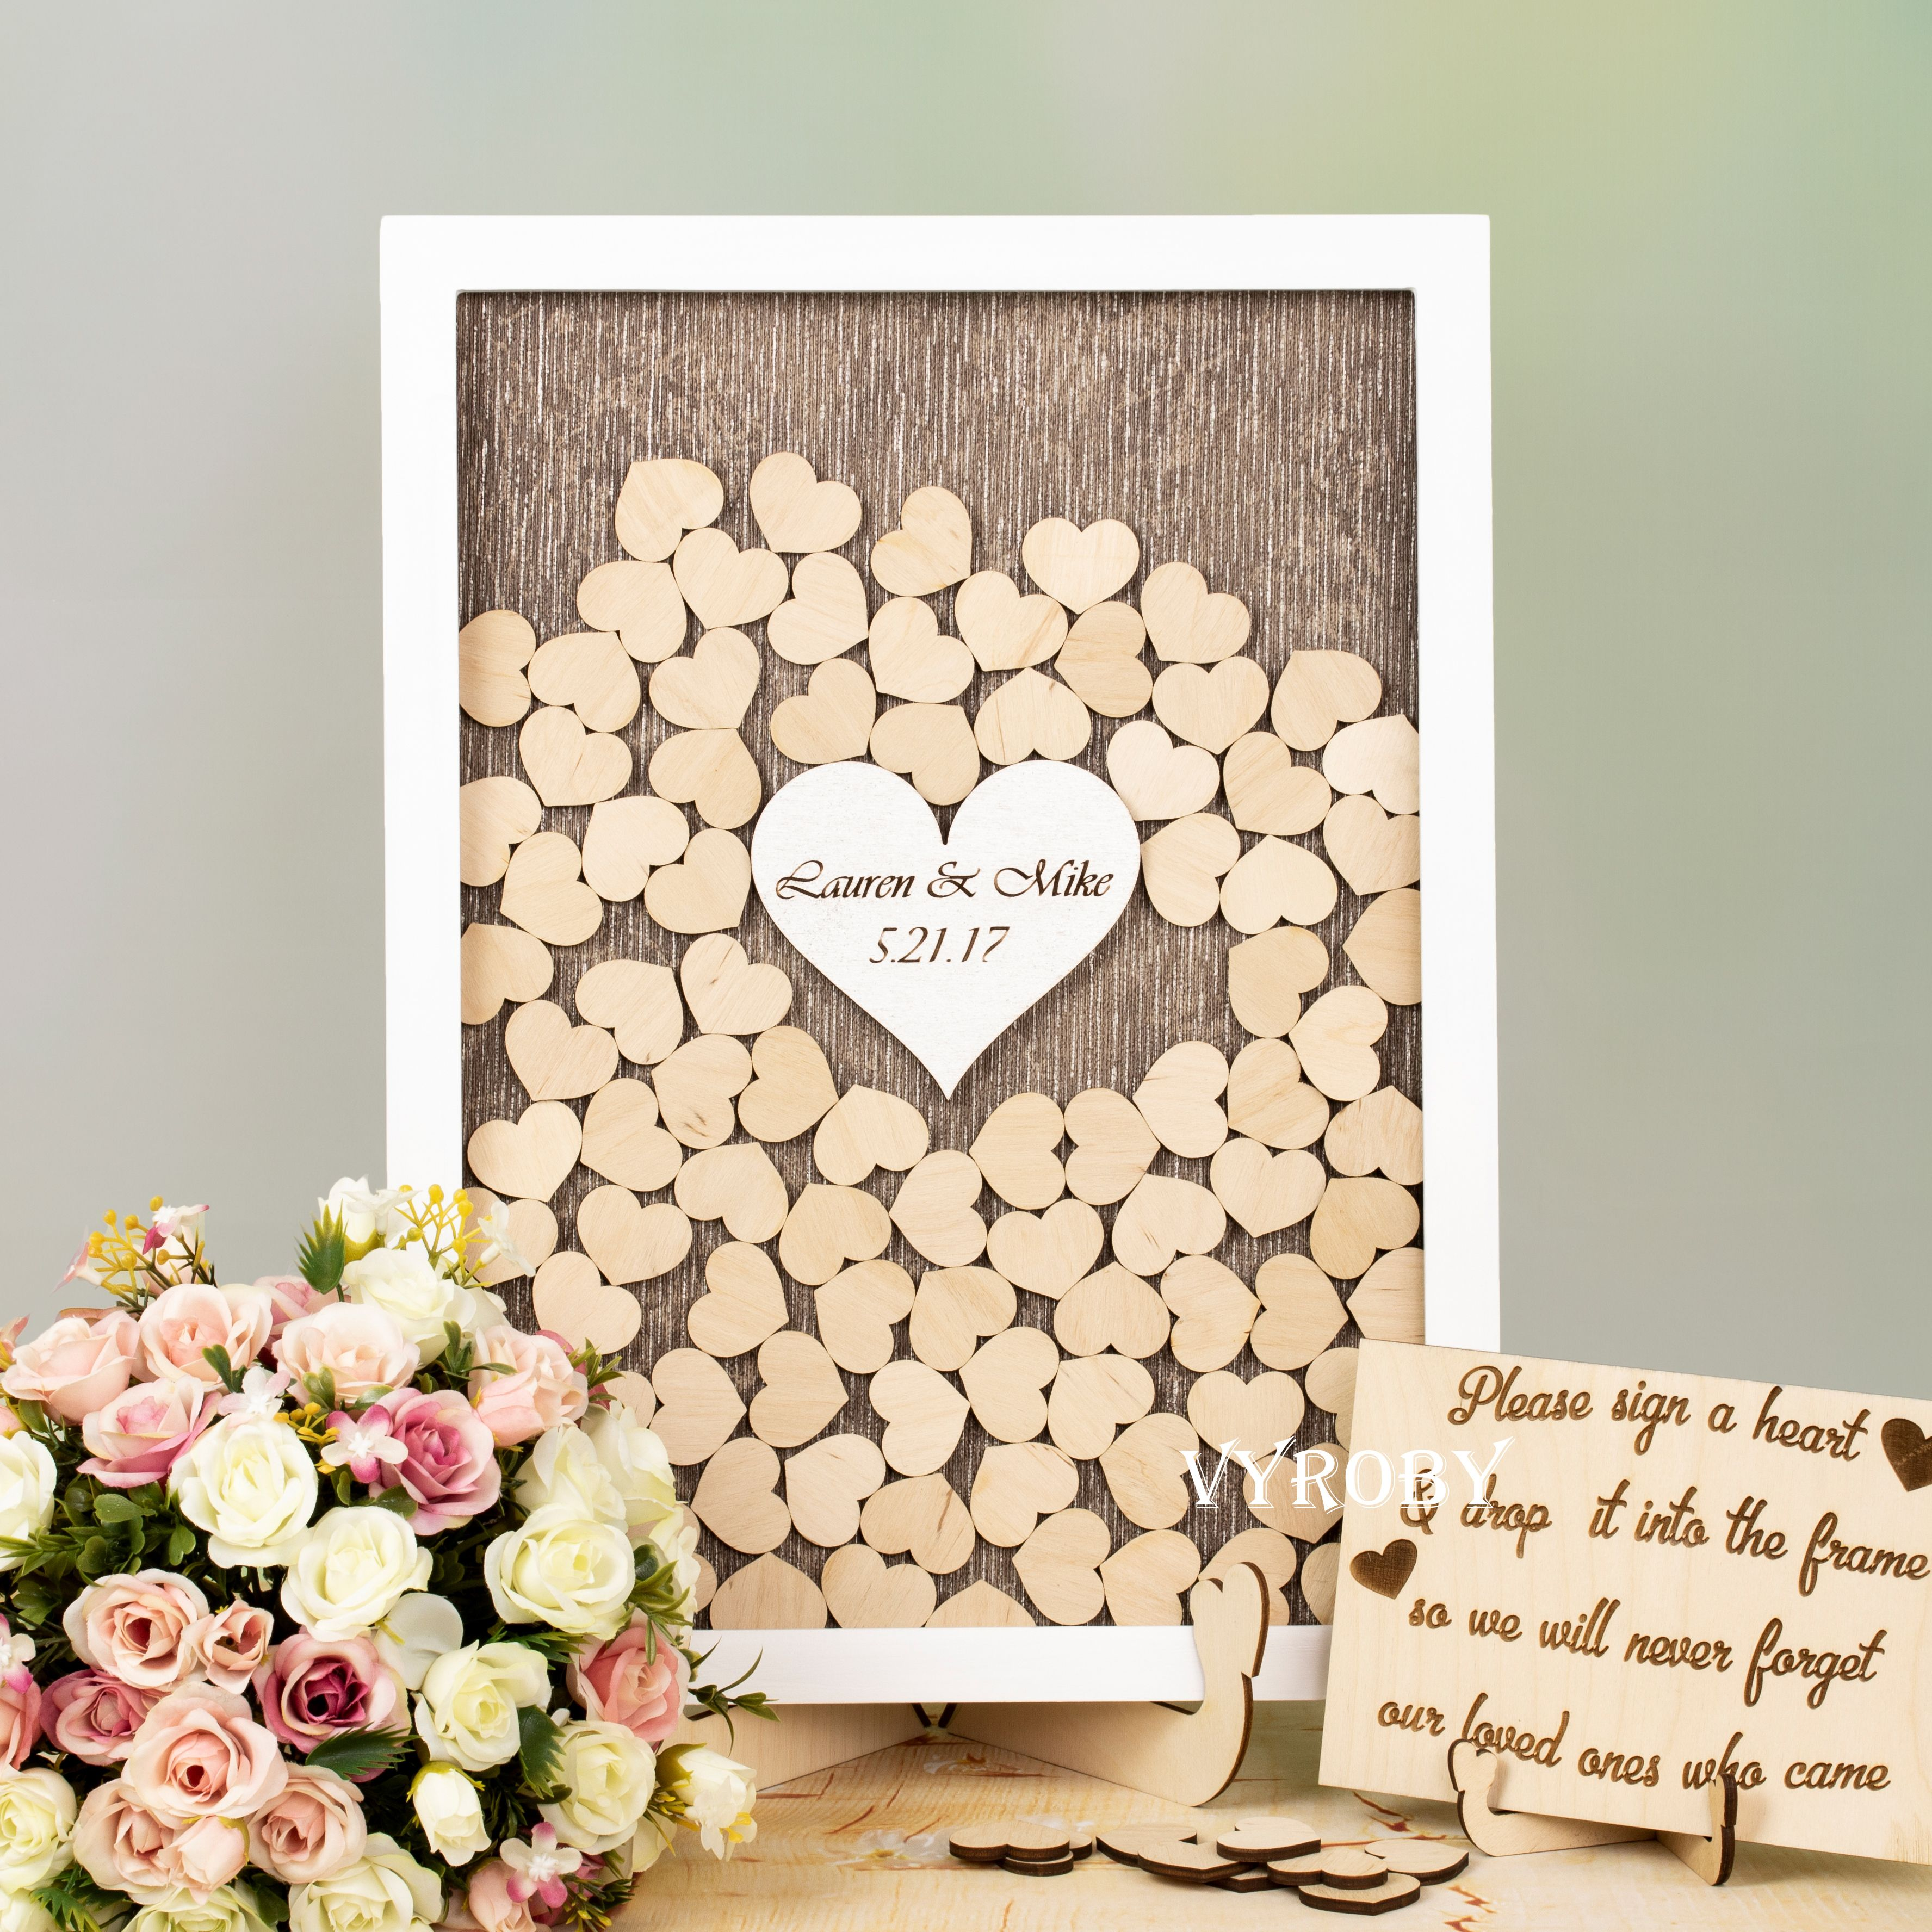 Unique Guest Book Ideas For Wedding Alternative Guest Book Wedding Bridal Sho Wedding Guest Book Unique Wedding Drop Box Rustic Wedding Guest Book Alternative